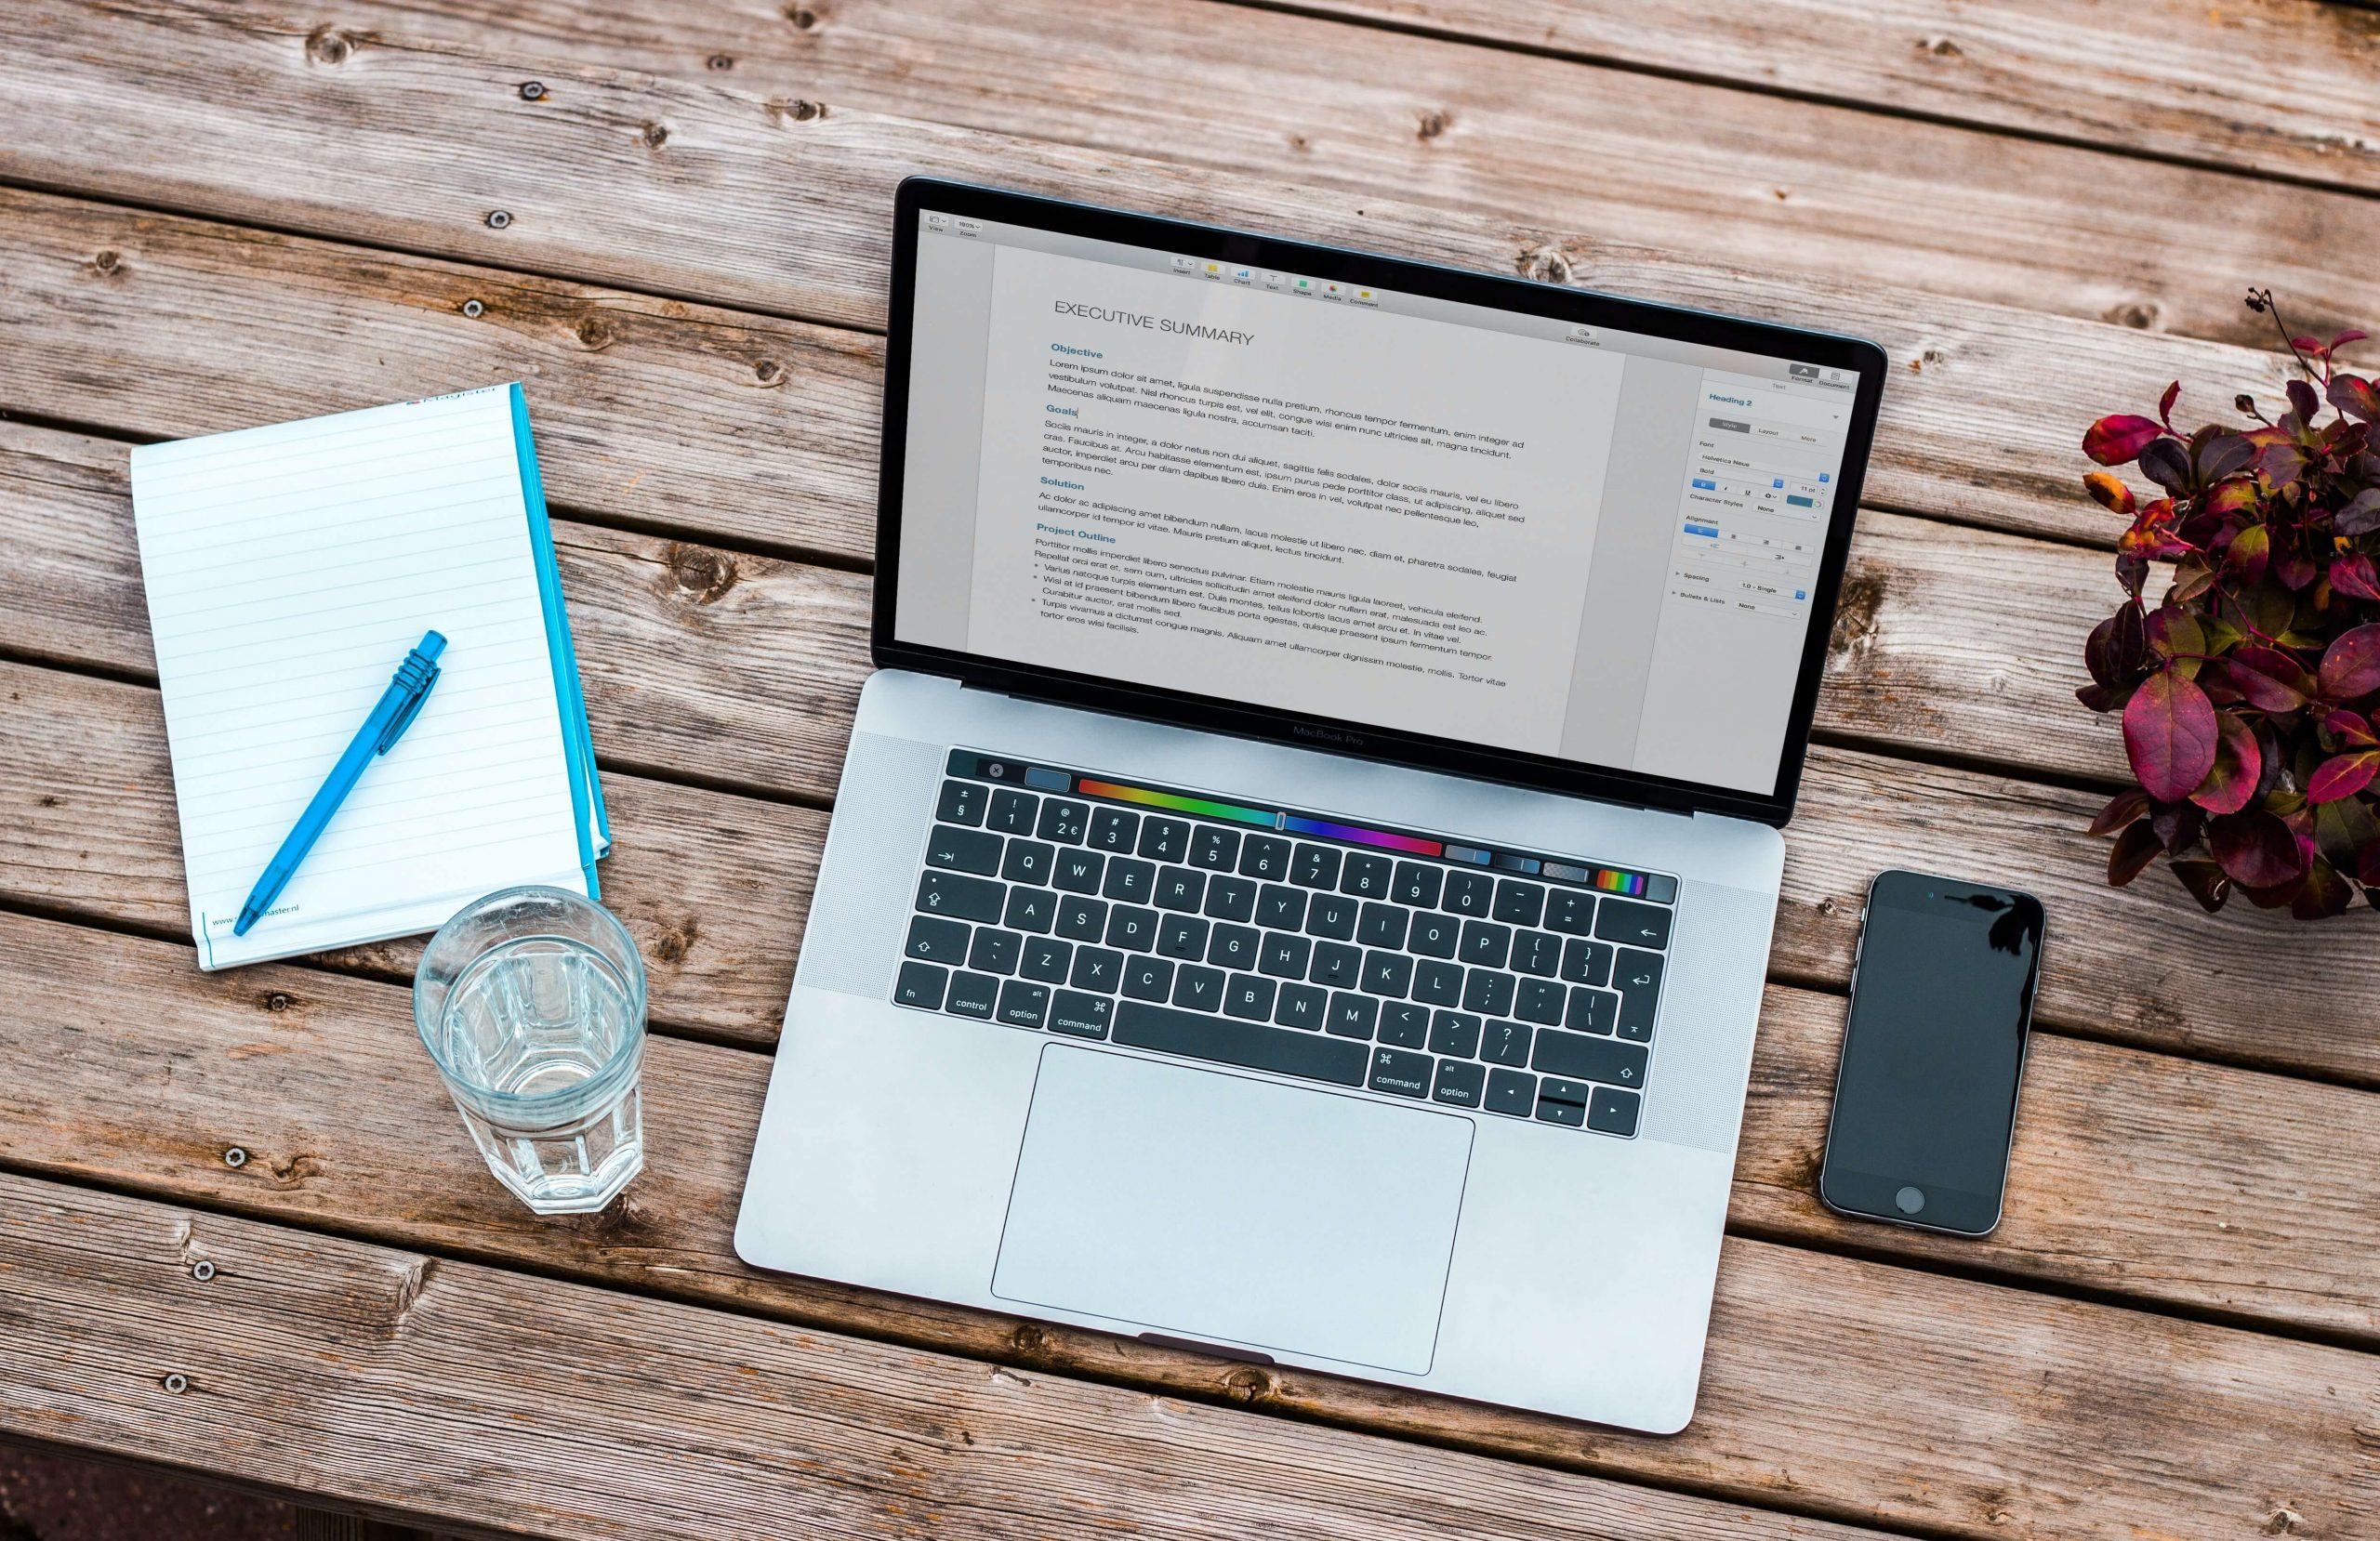 Best Laptop for Mobile Office